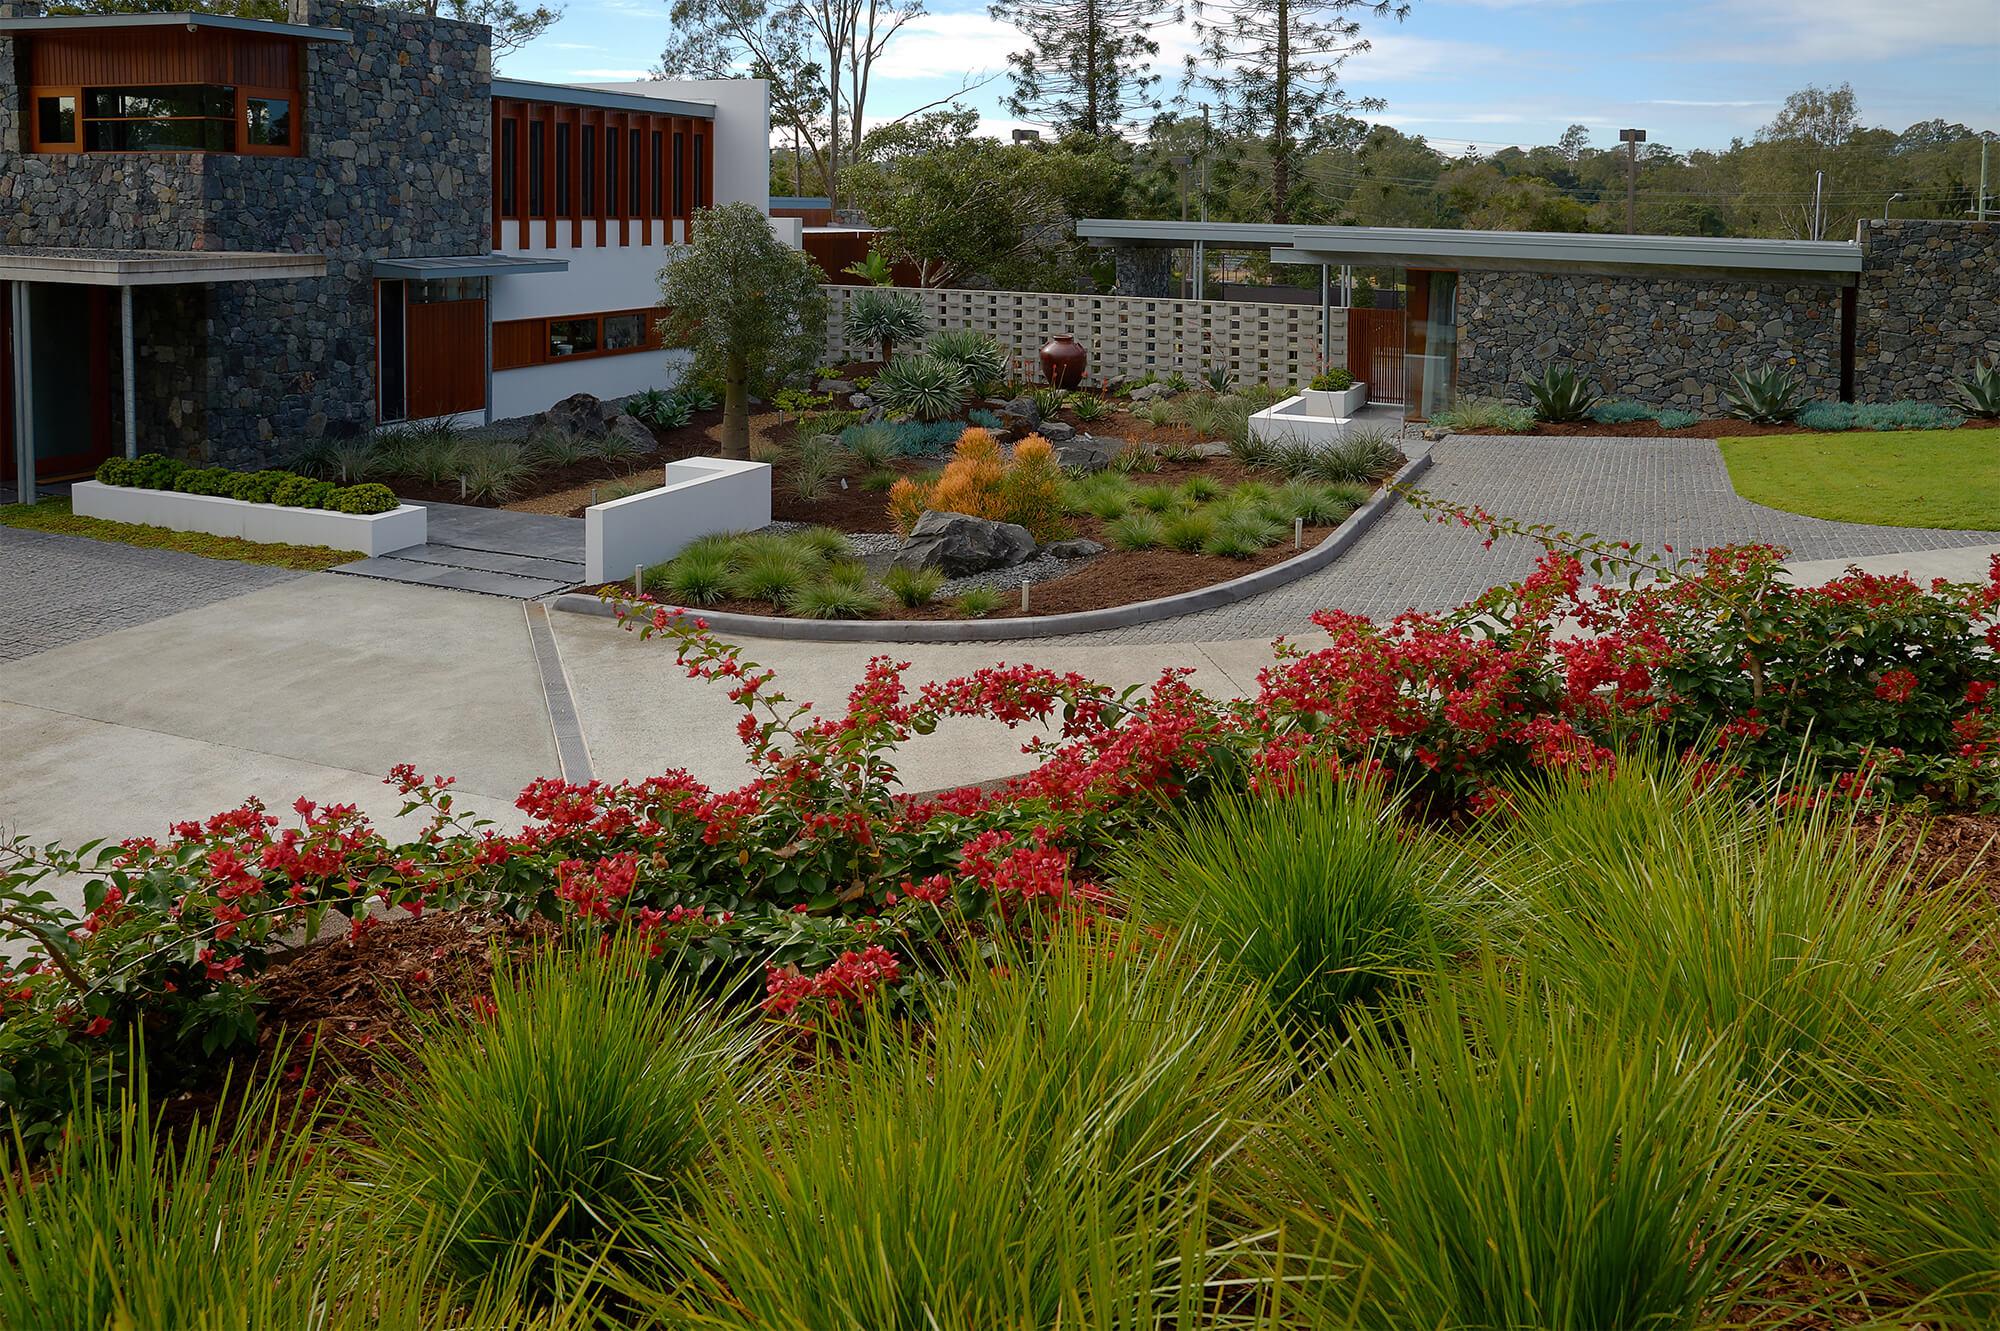 brookfield contemporary arid landscaping entry garden bougainvillea